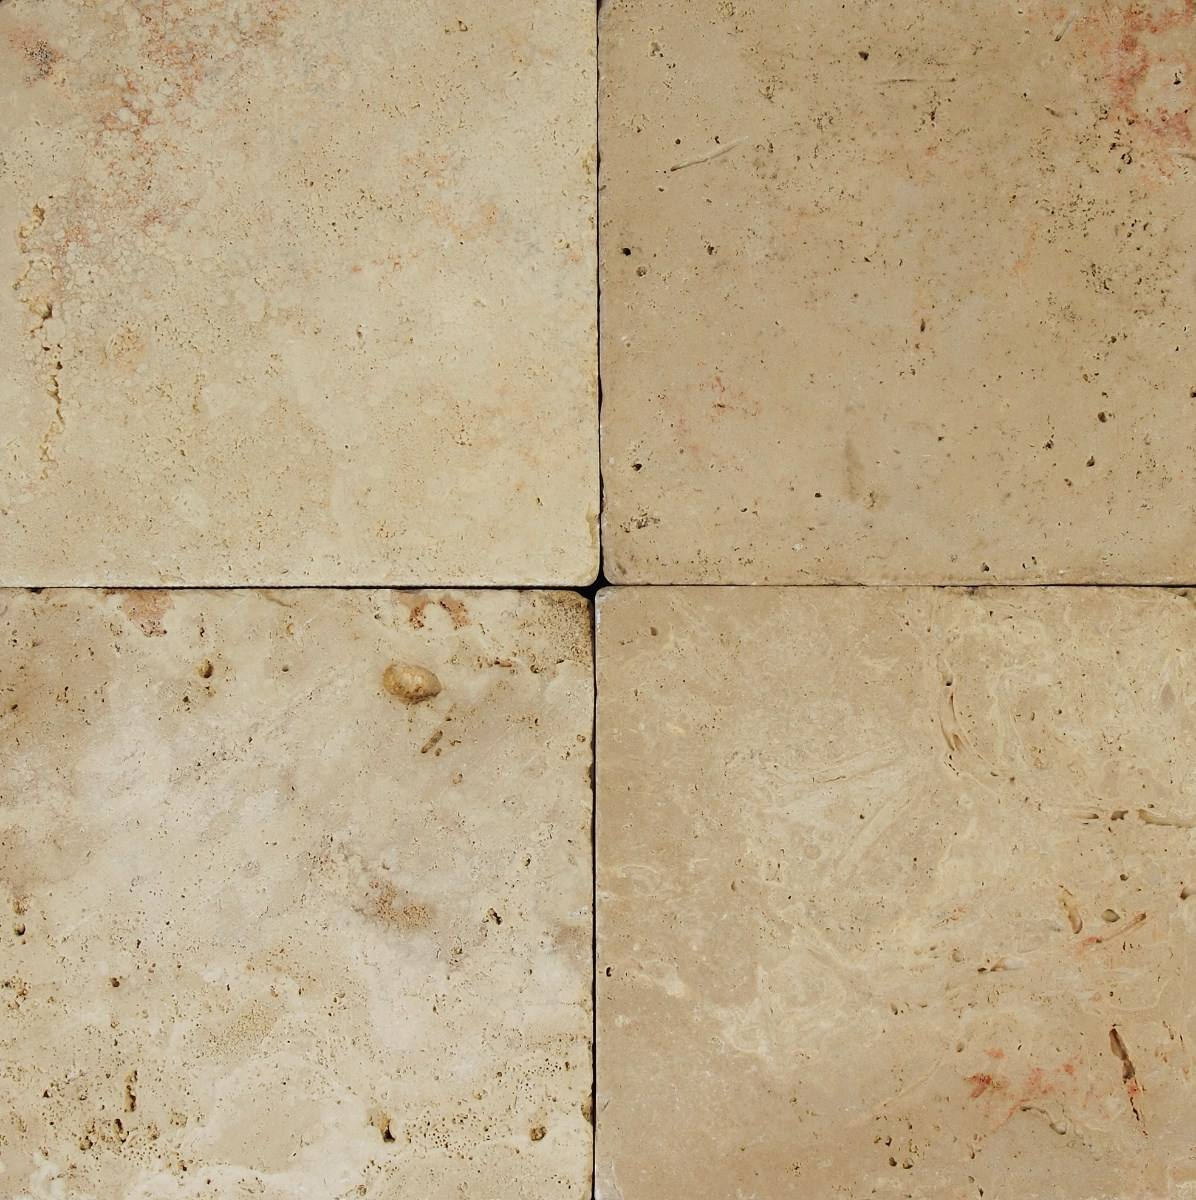 Marmol travertino tomboleado 190 00 m2 calidad primera for Marmol travertino precio